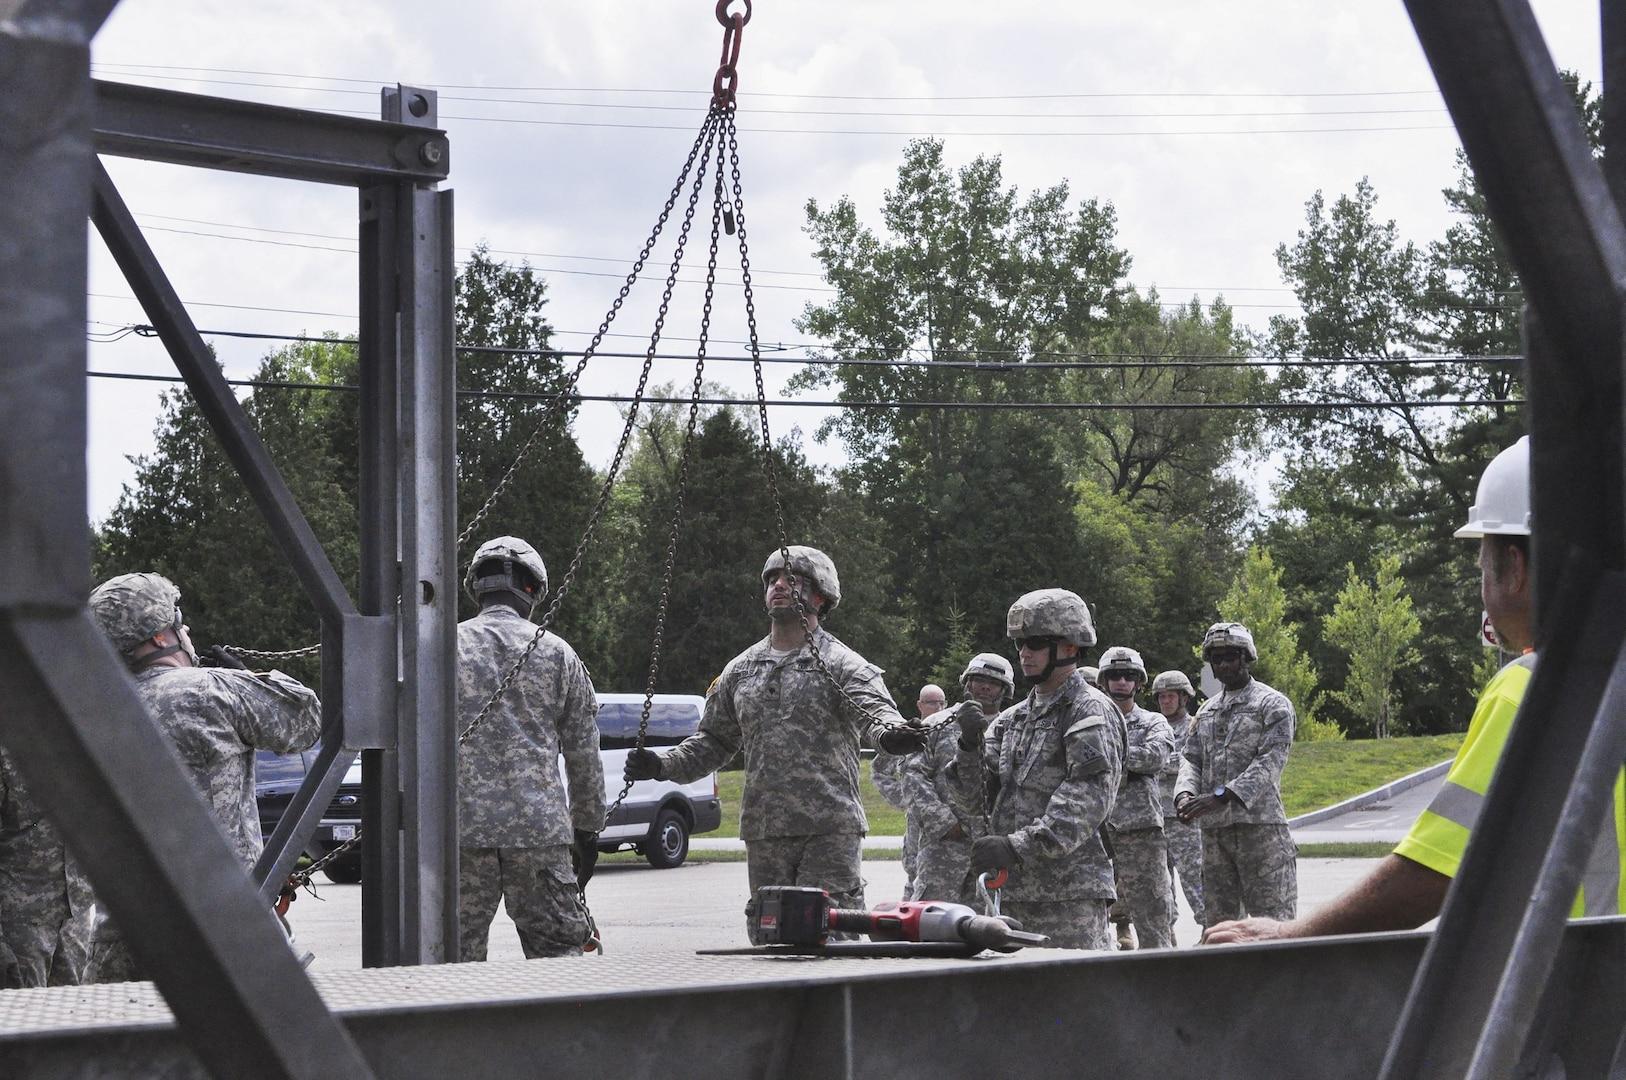 Vigilant Guard Training